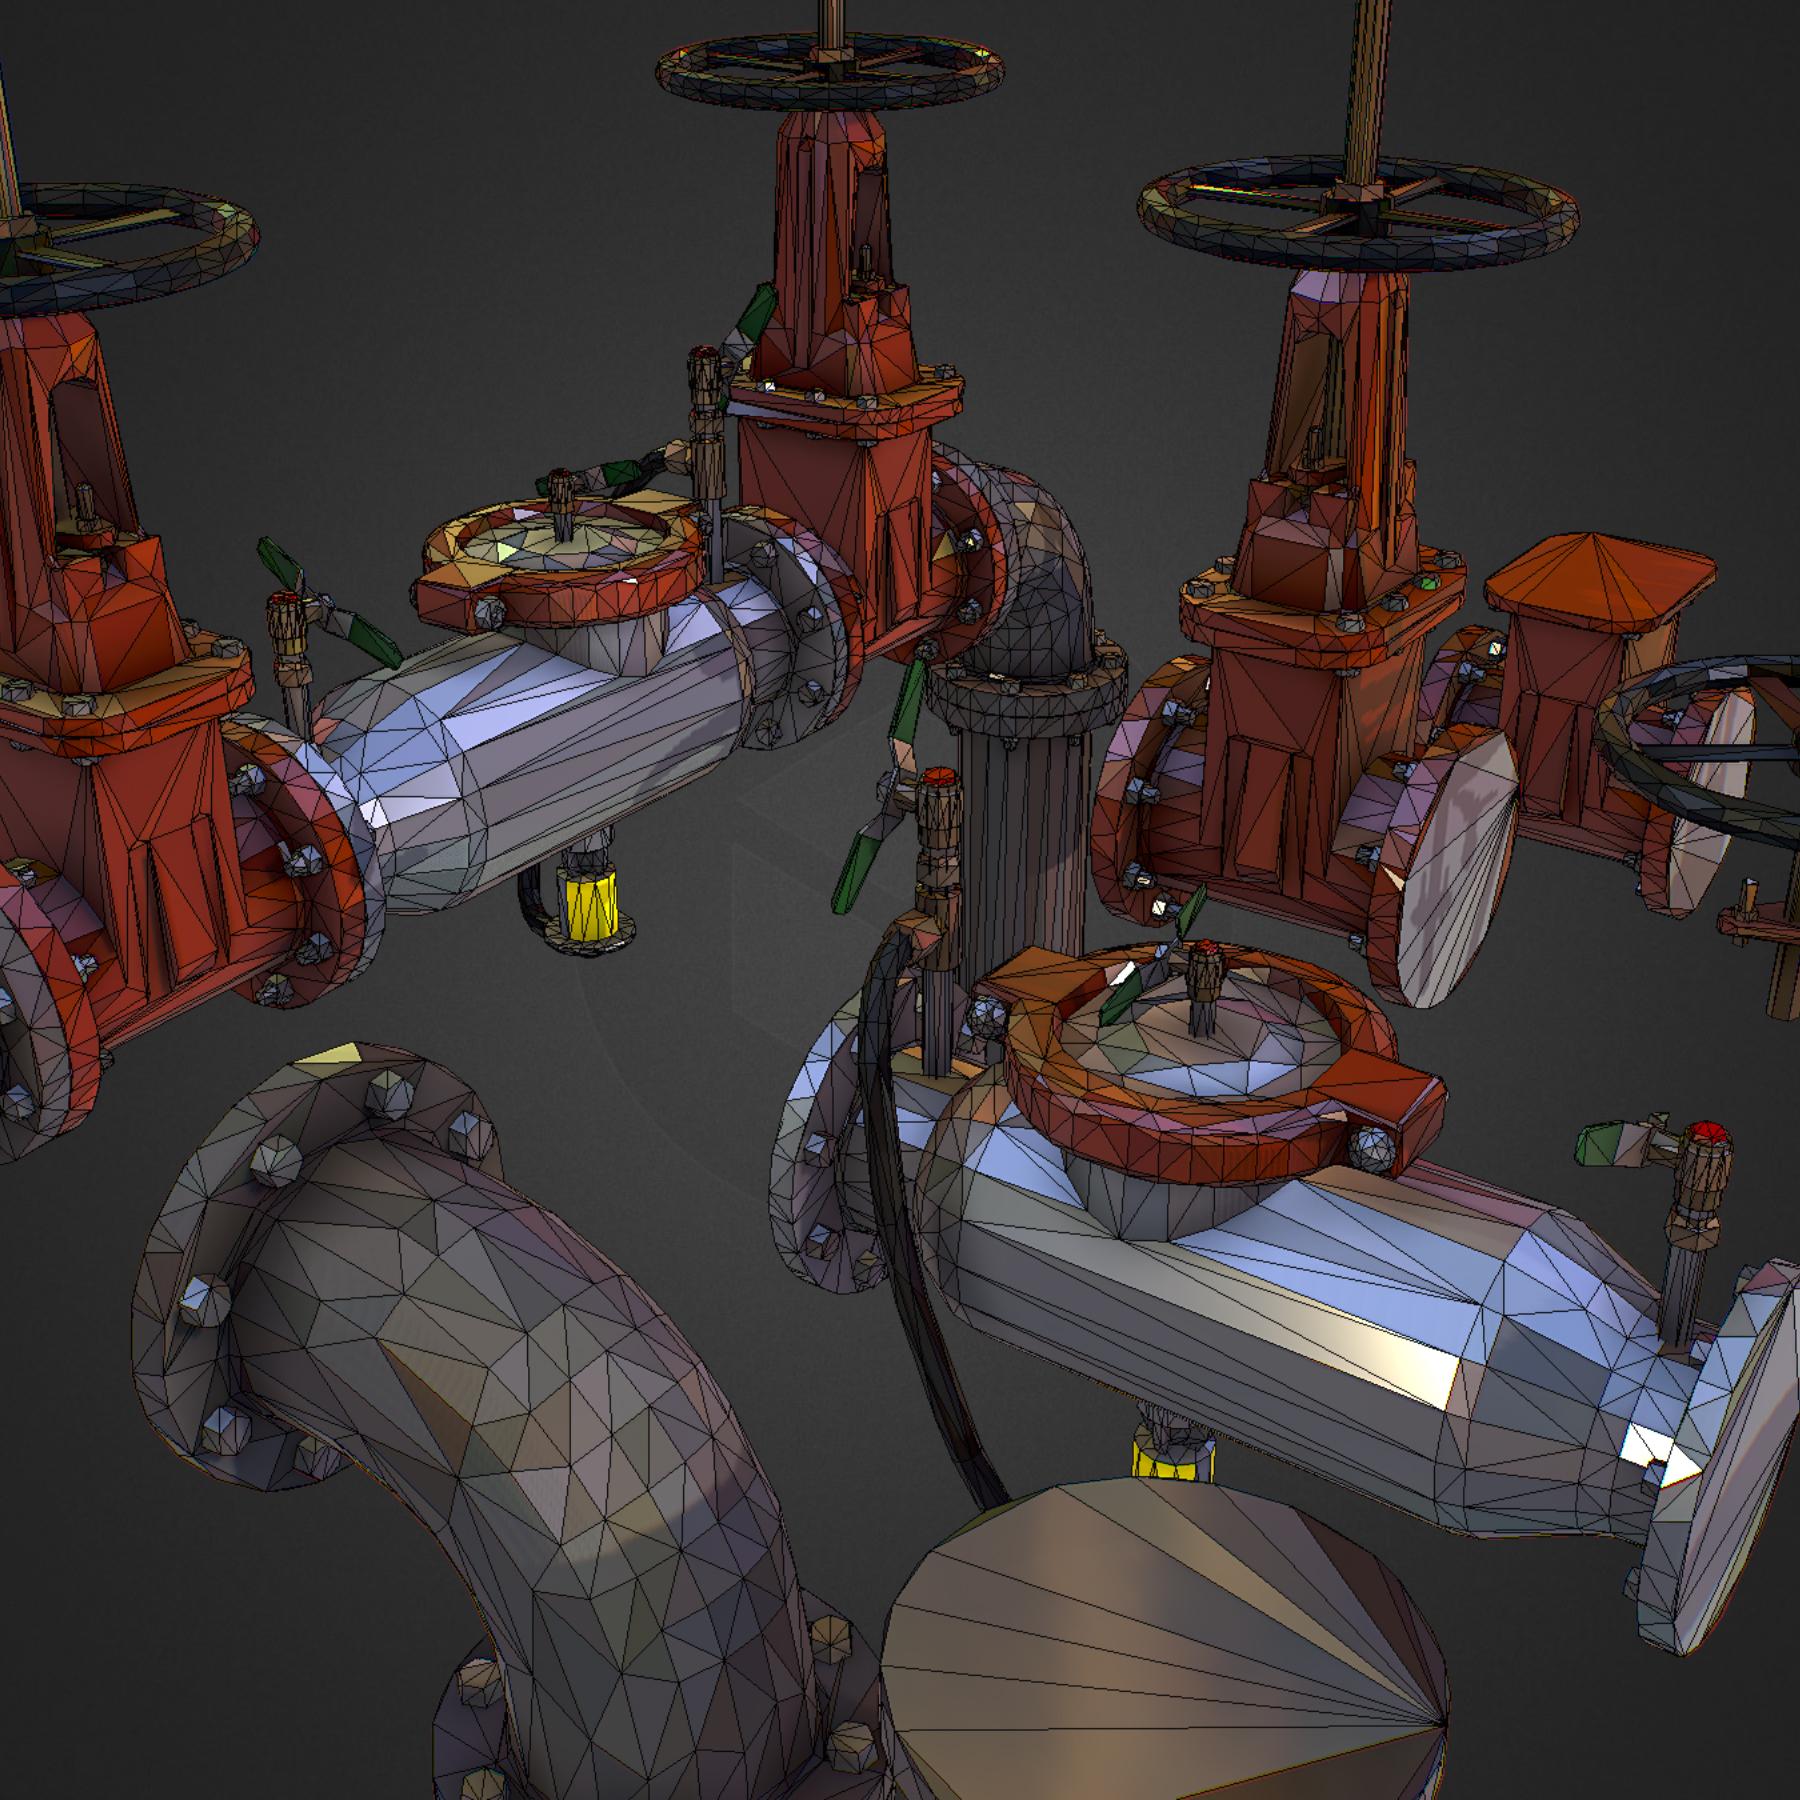 Low Poly ART Backflow Water Pipe Constructor 3d model max 3ds max plugin fbx ma mb tga targa icb vda vst pix obj 272567